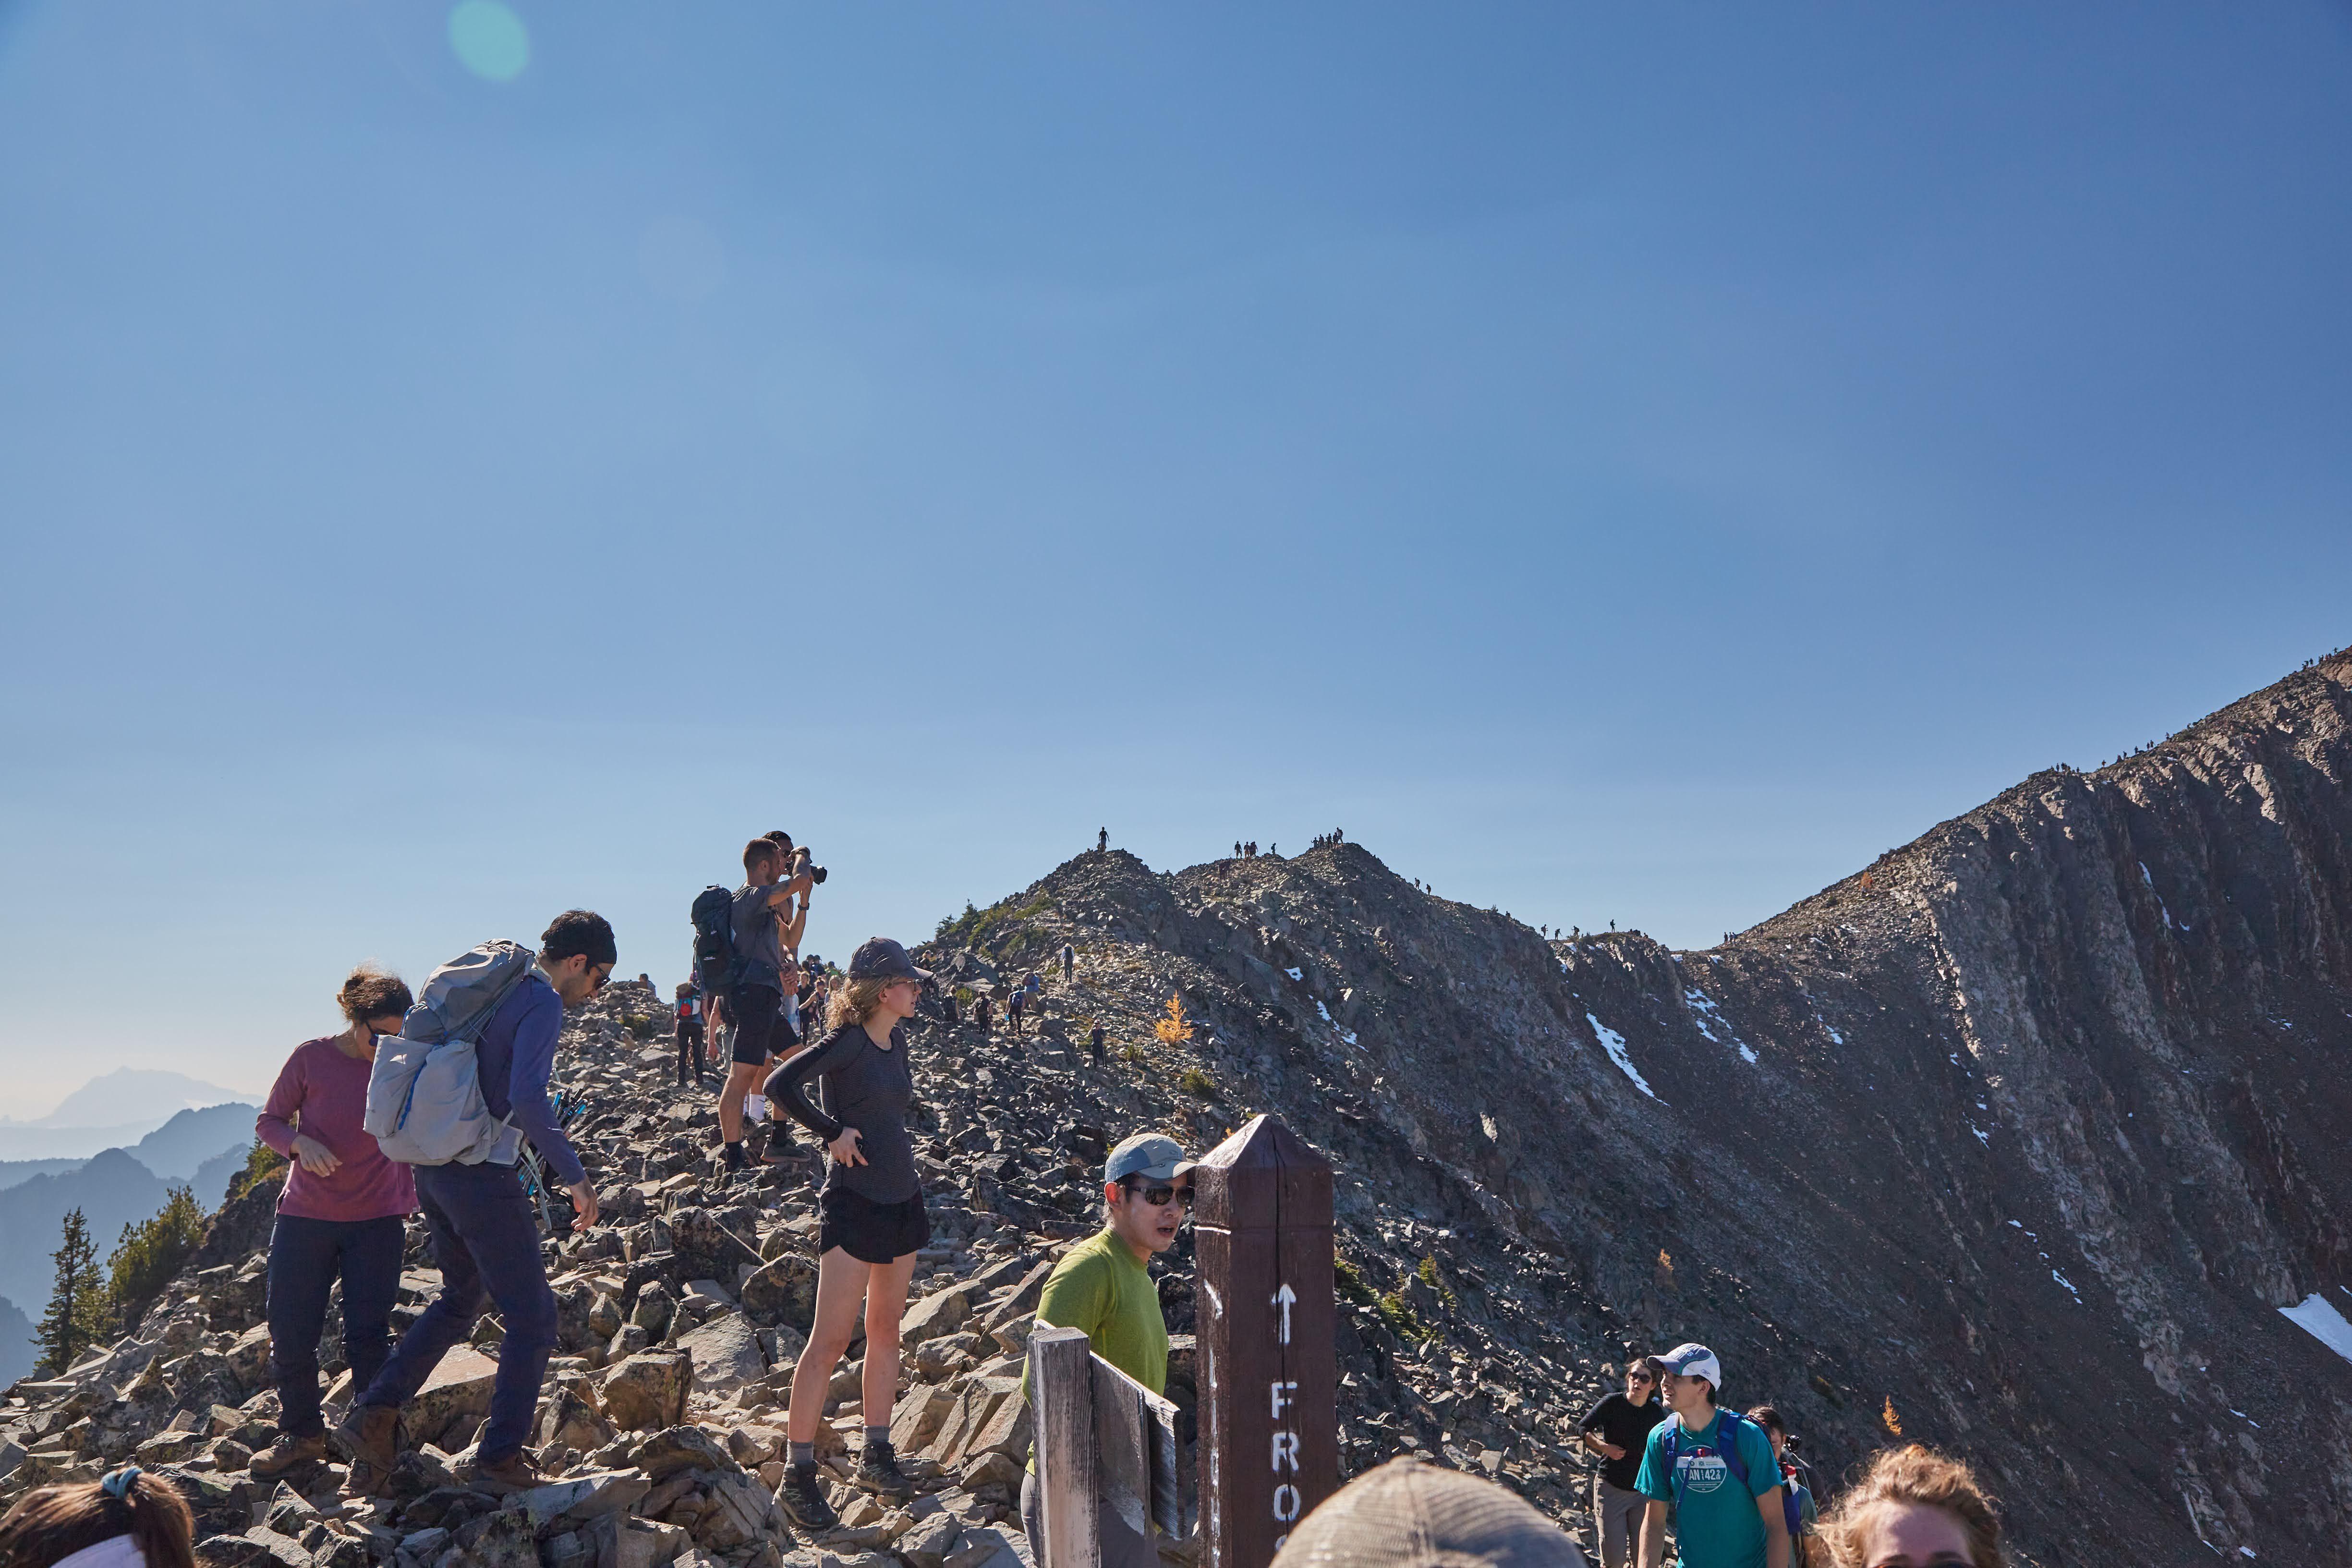 The crowds on the ridge up to Mt. Frosty. Photo by Radek Kloska.